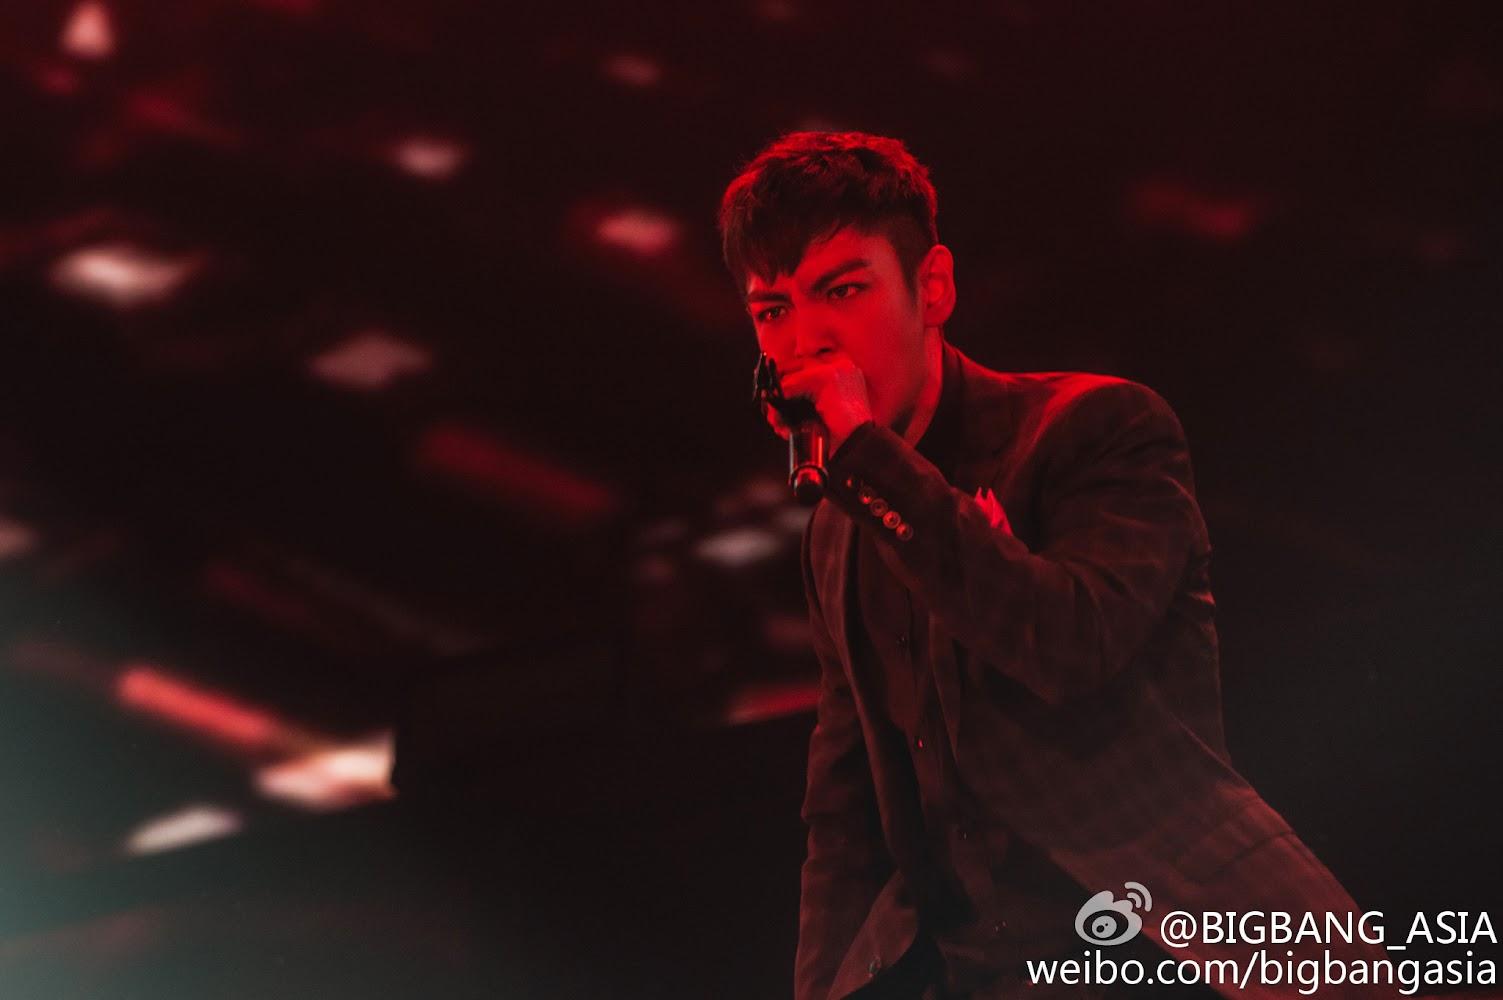 Big Bang - Made V.I.P Tour - Nanjing - 19mar2016 - BIGBANG_ASIA - 09.jpg